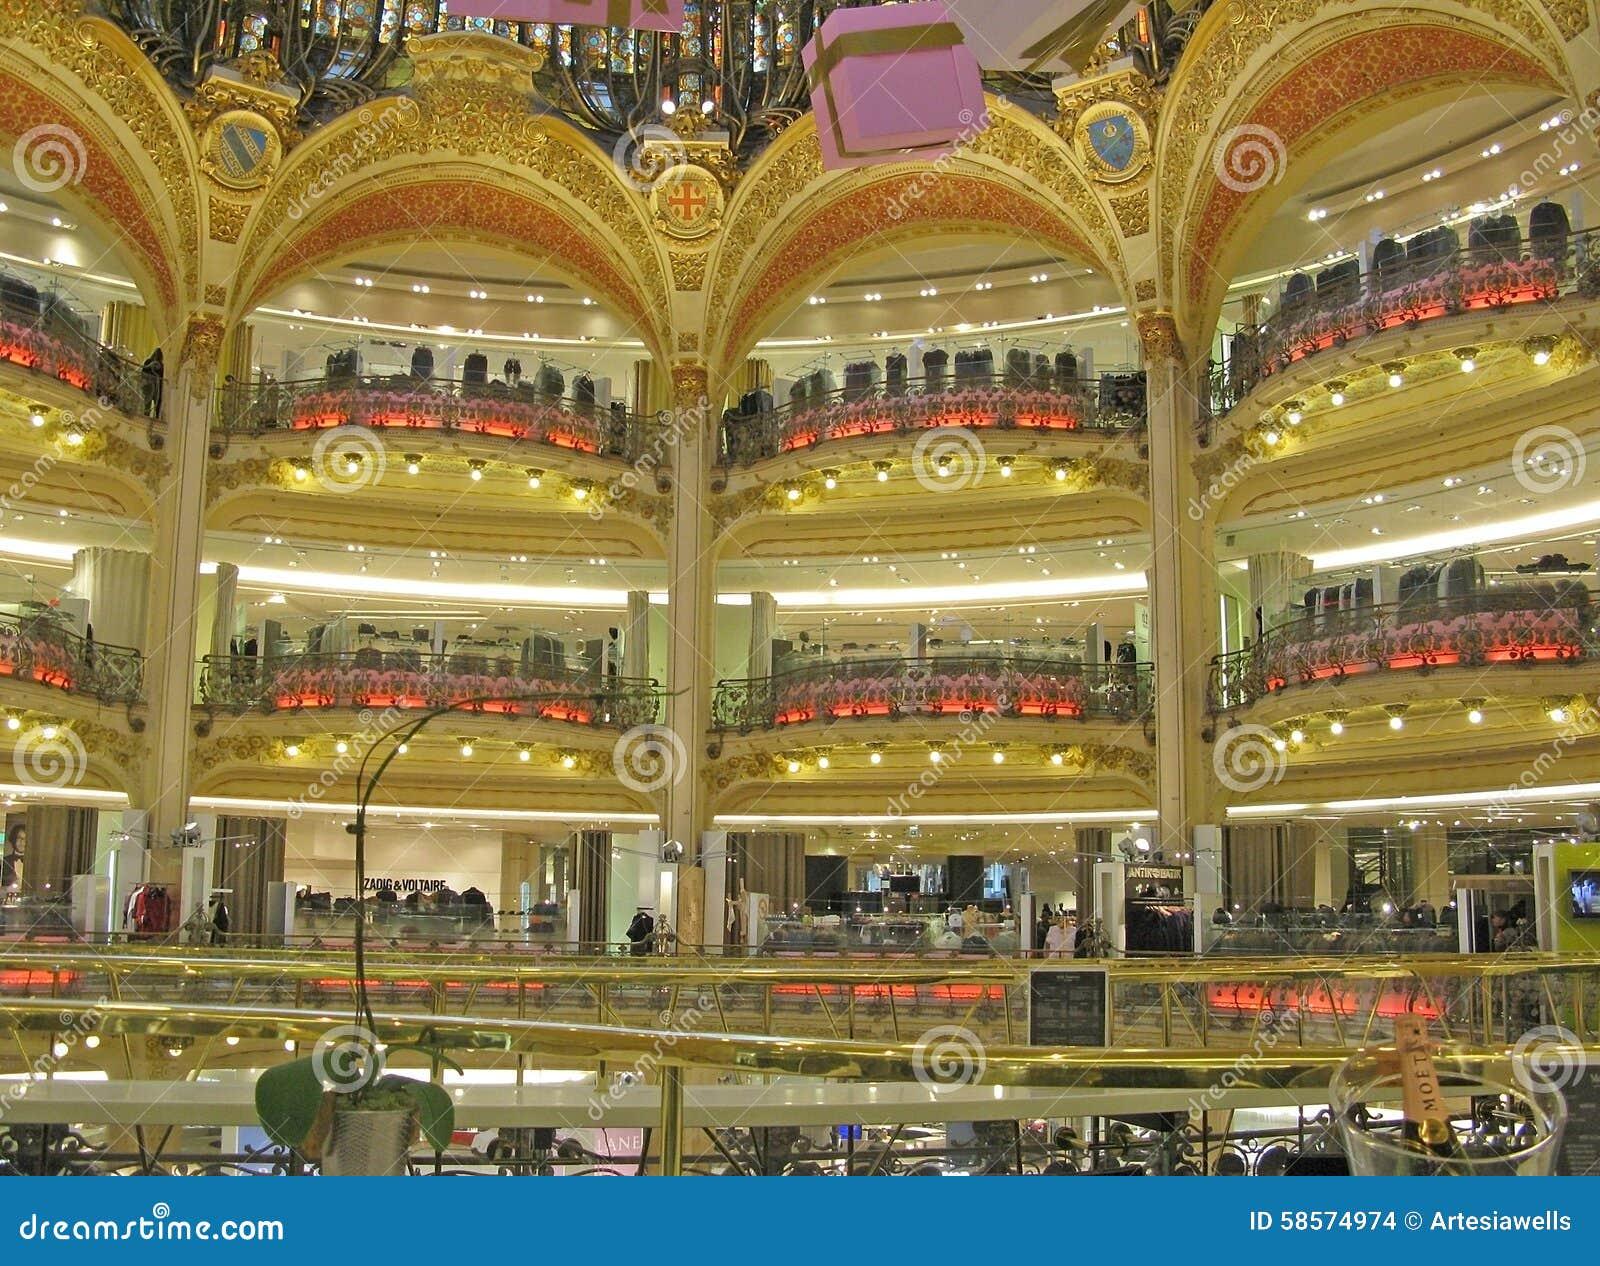 La belle epoque editorial stock image image 58574974 - Belle epoque interiors ...